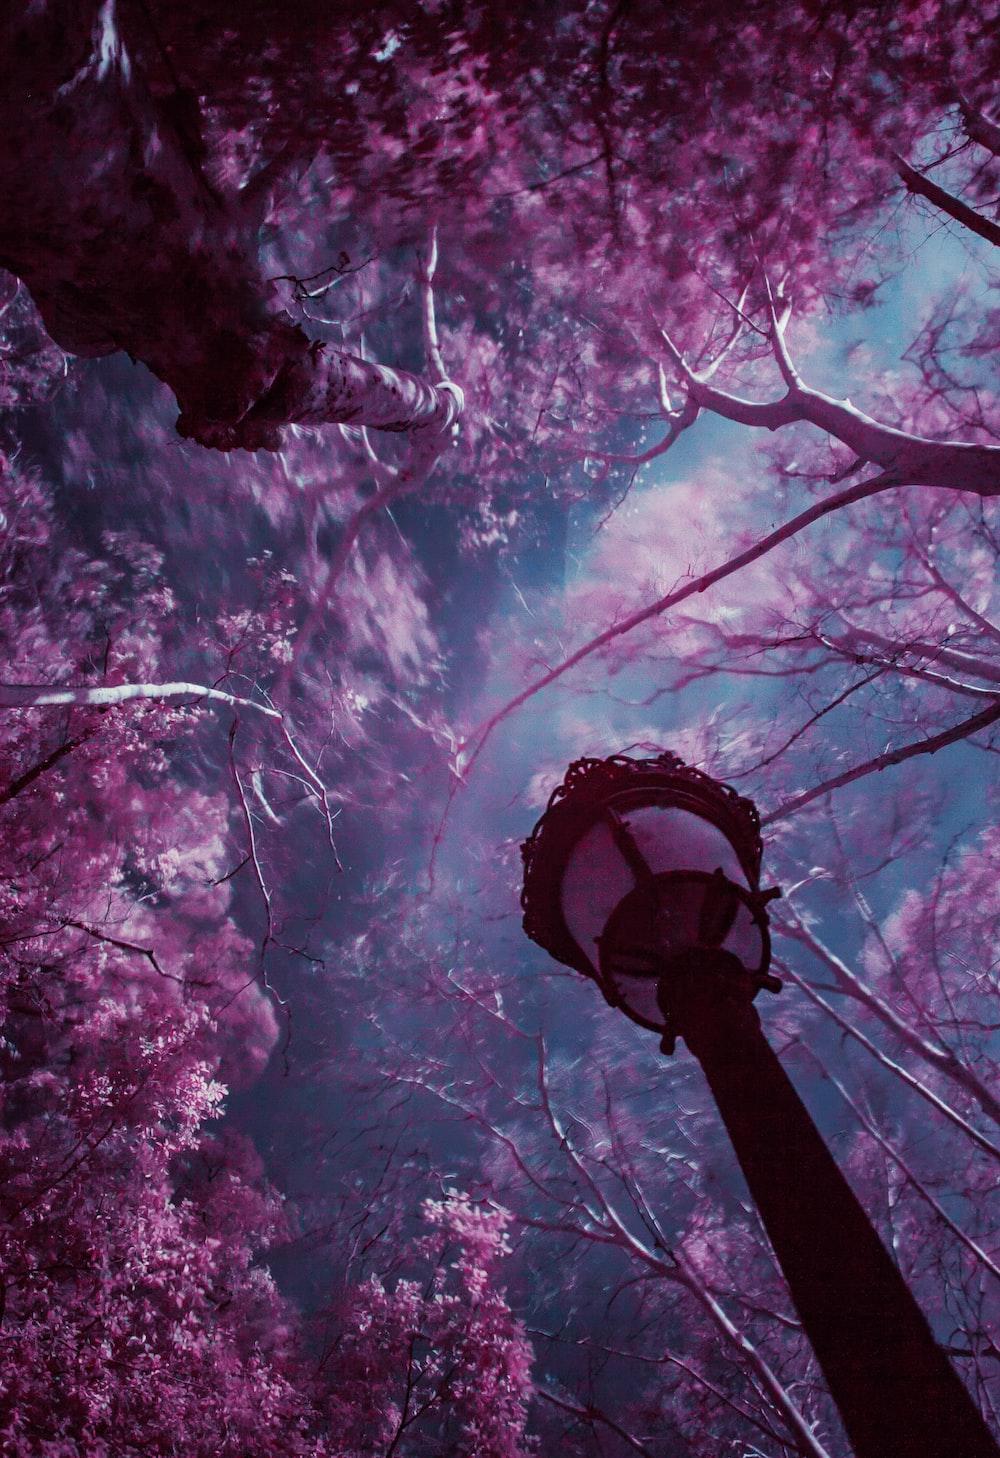 100 fantasy pictures download free images on unsplash voltagebd Choice Image